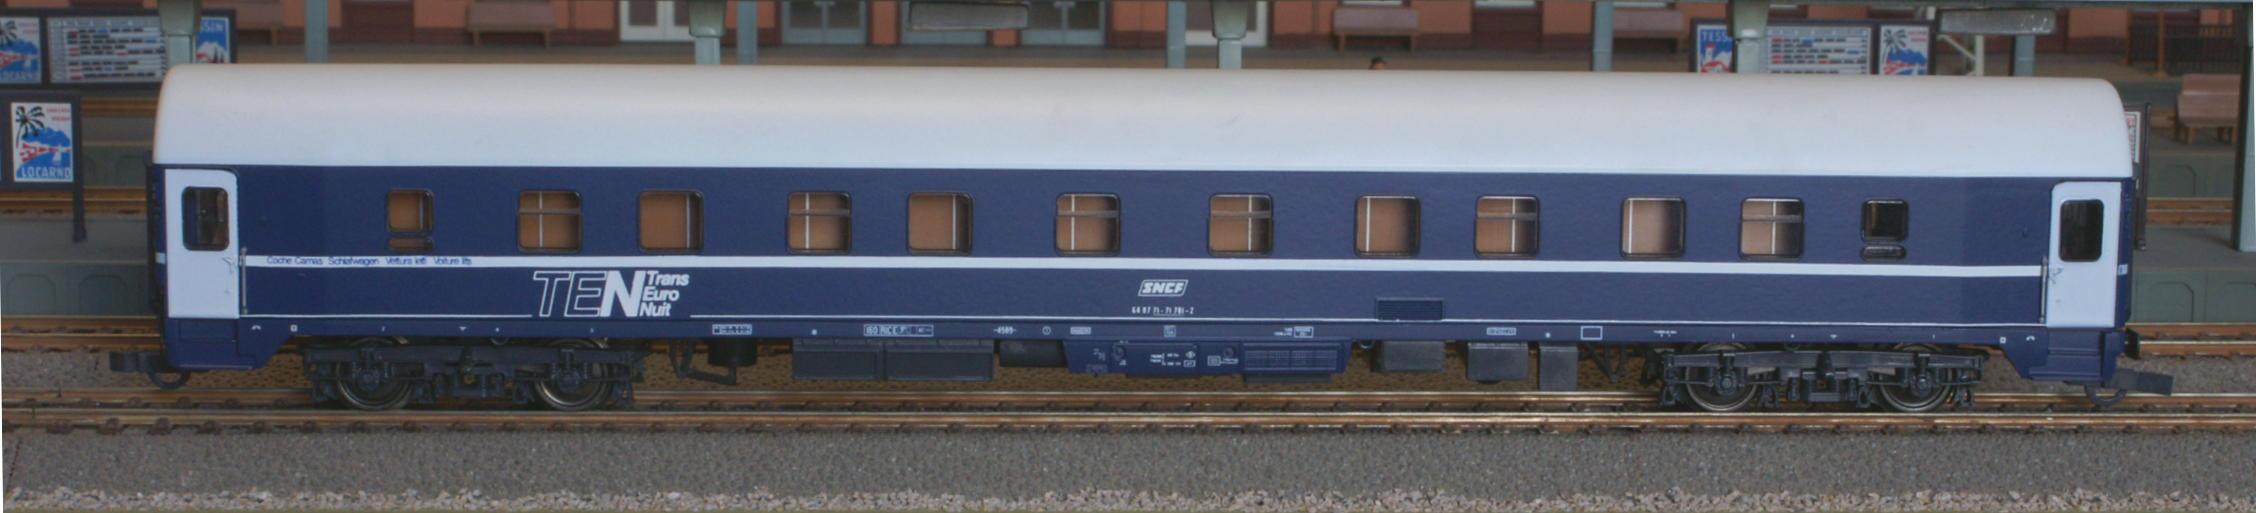 Roco 44840 - U-Hansa WLAB, SNCF TEN